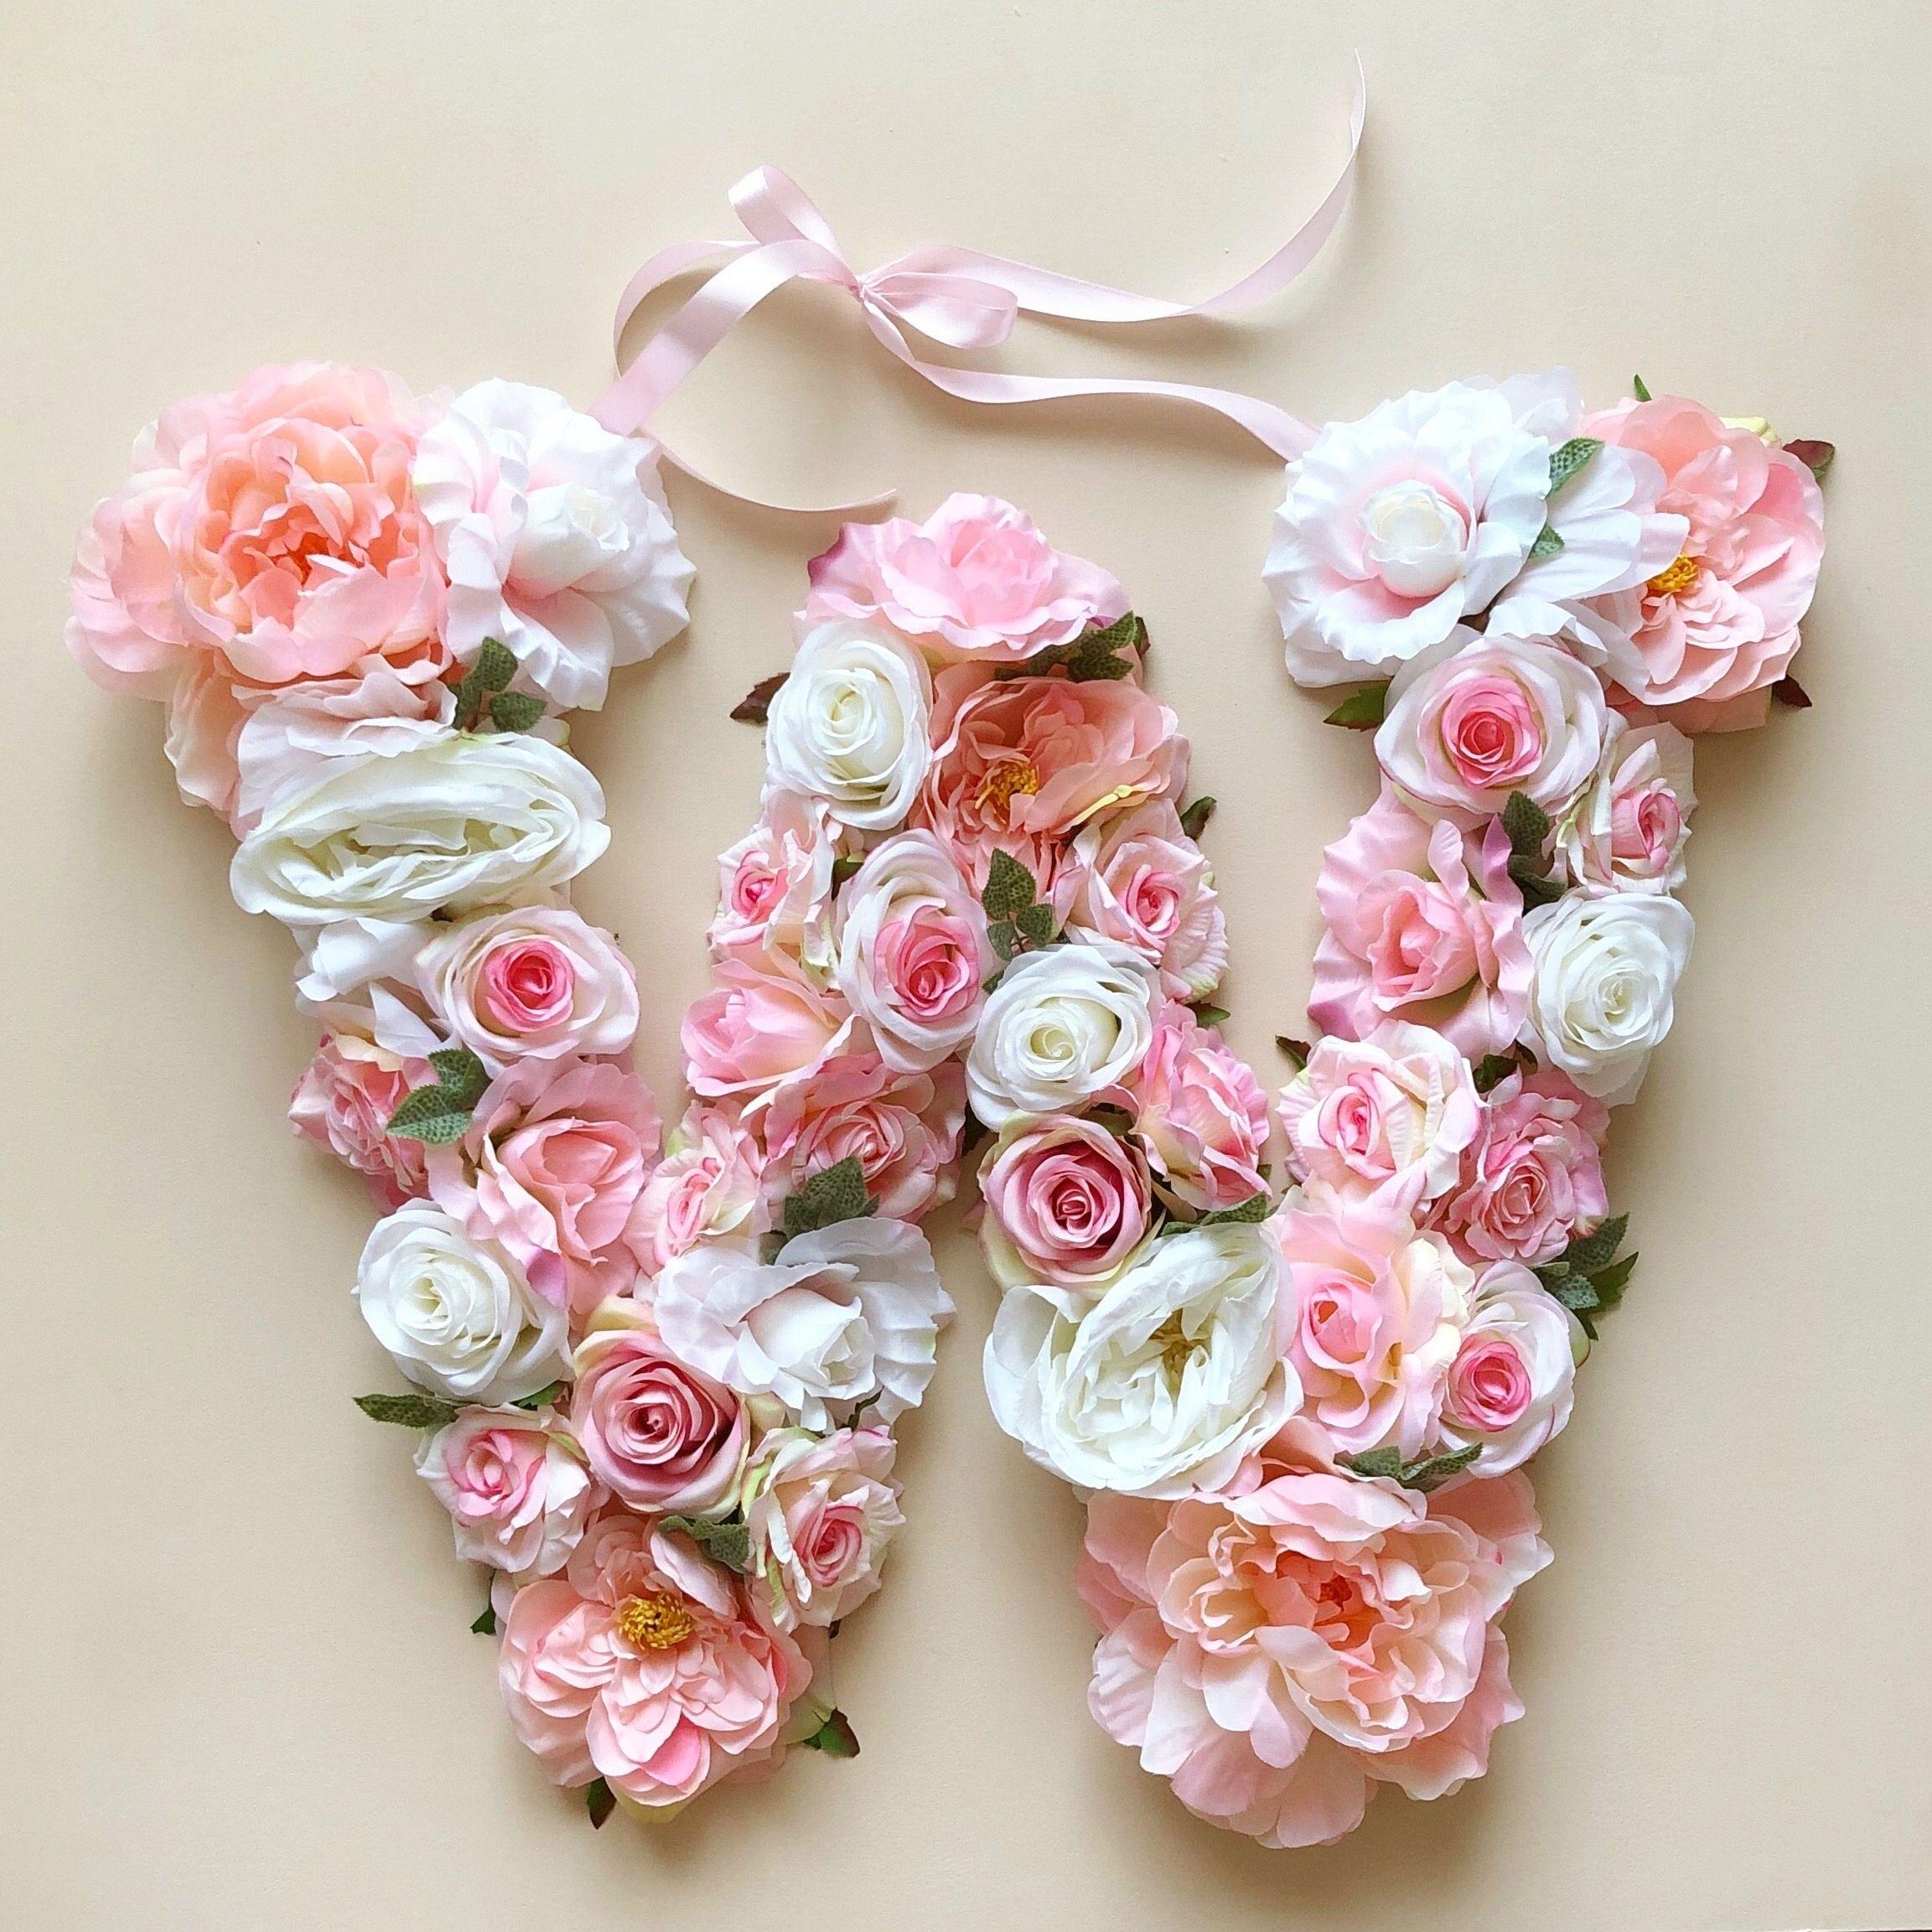 Flower Letter Floral Letter Baby Girl Room Initial Flower Letters Floral Letters Stylish Alphabets